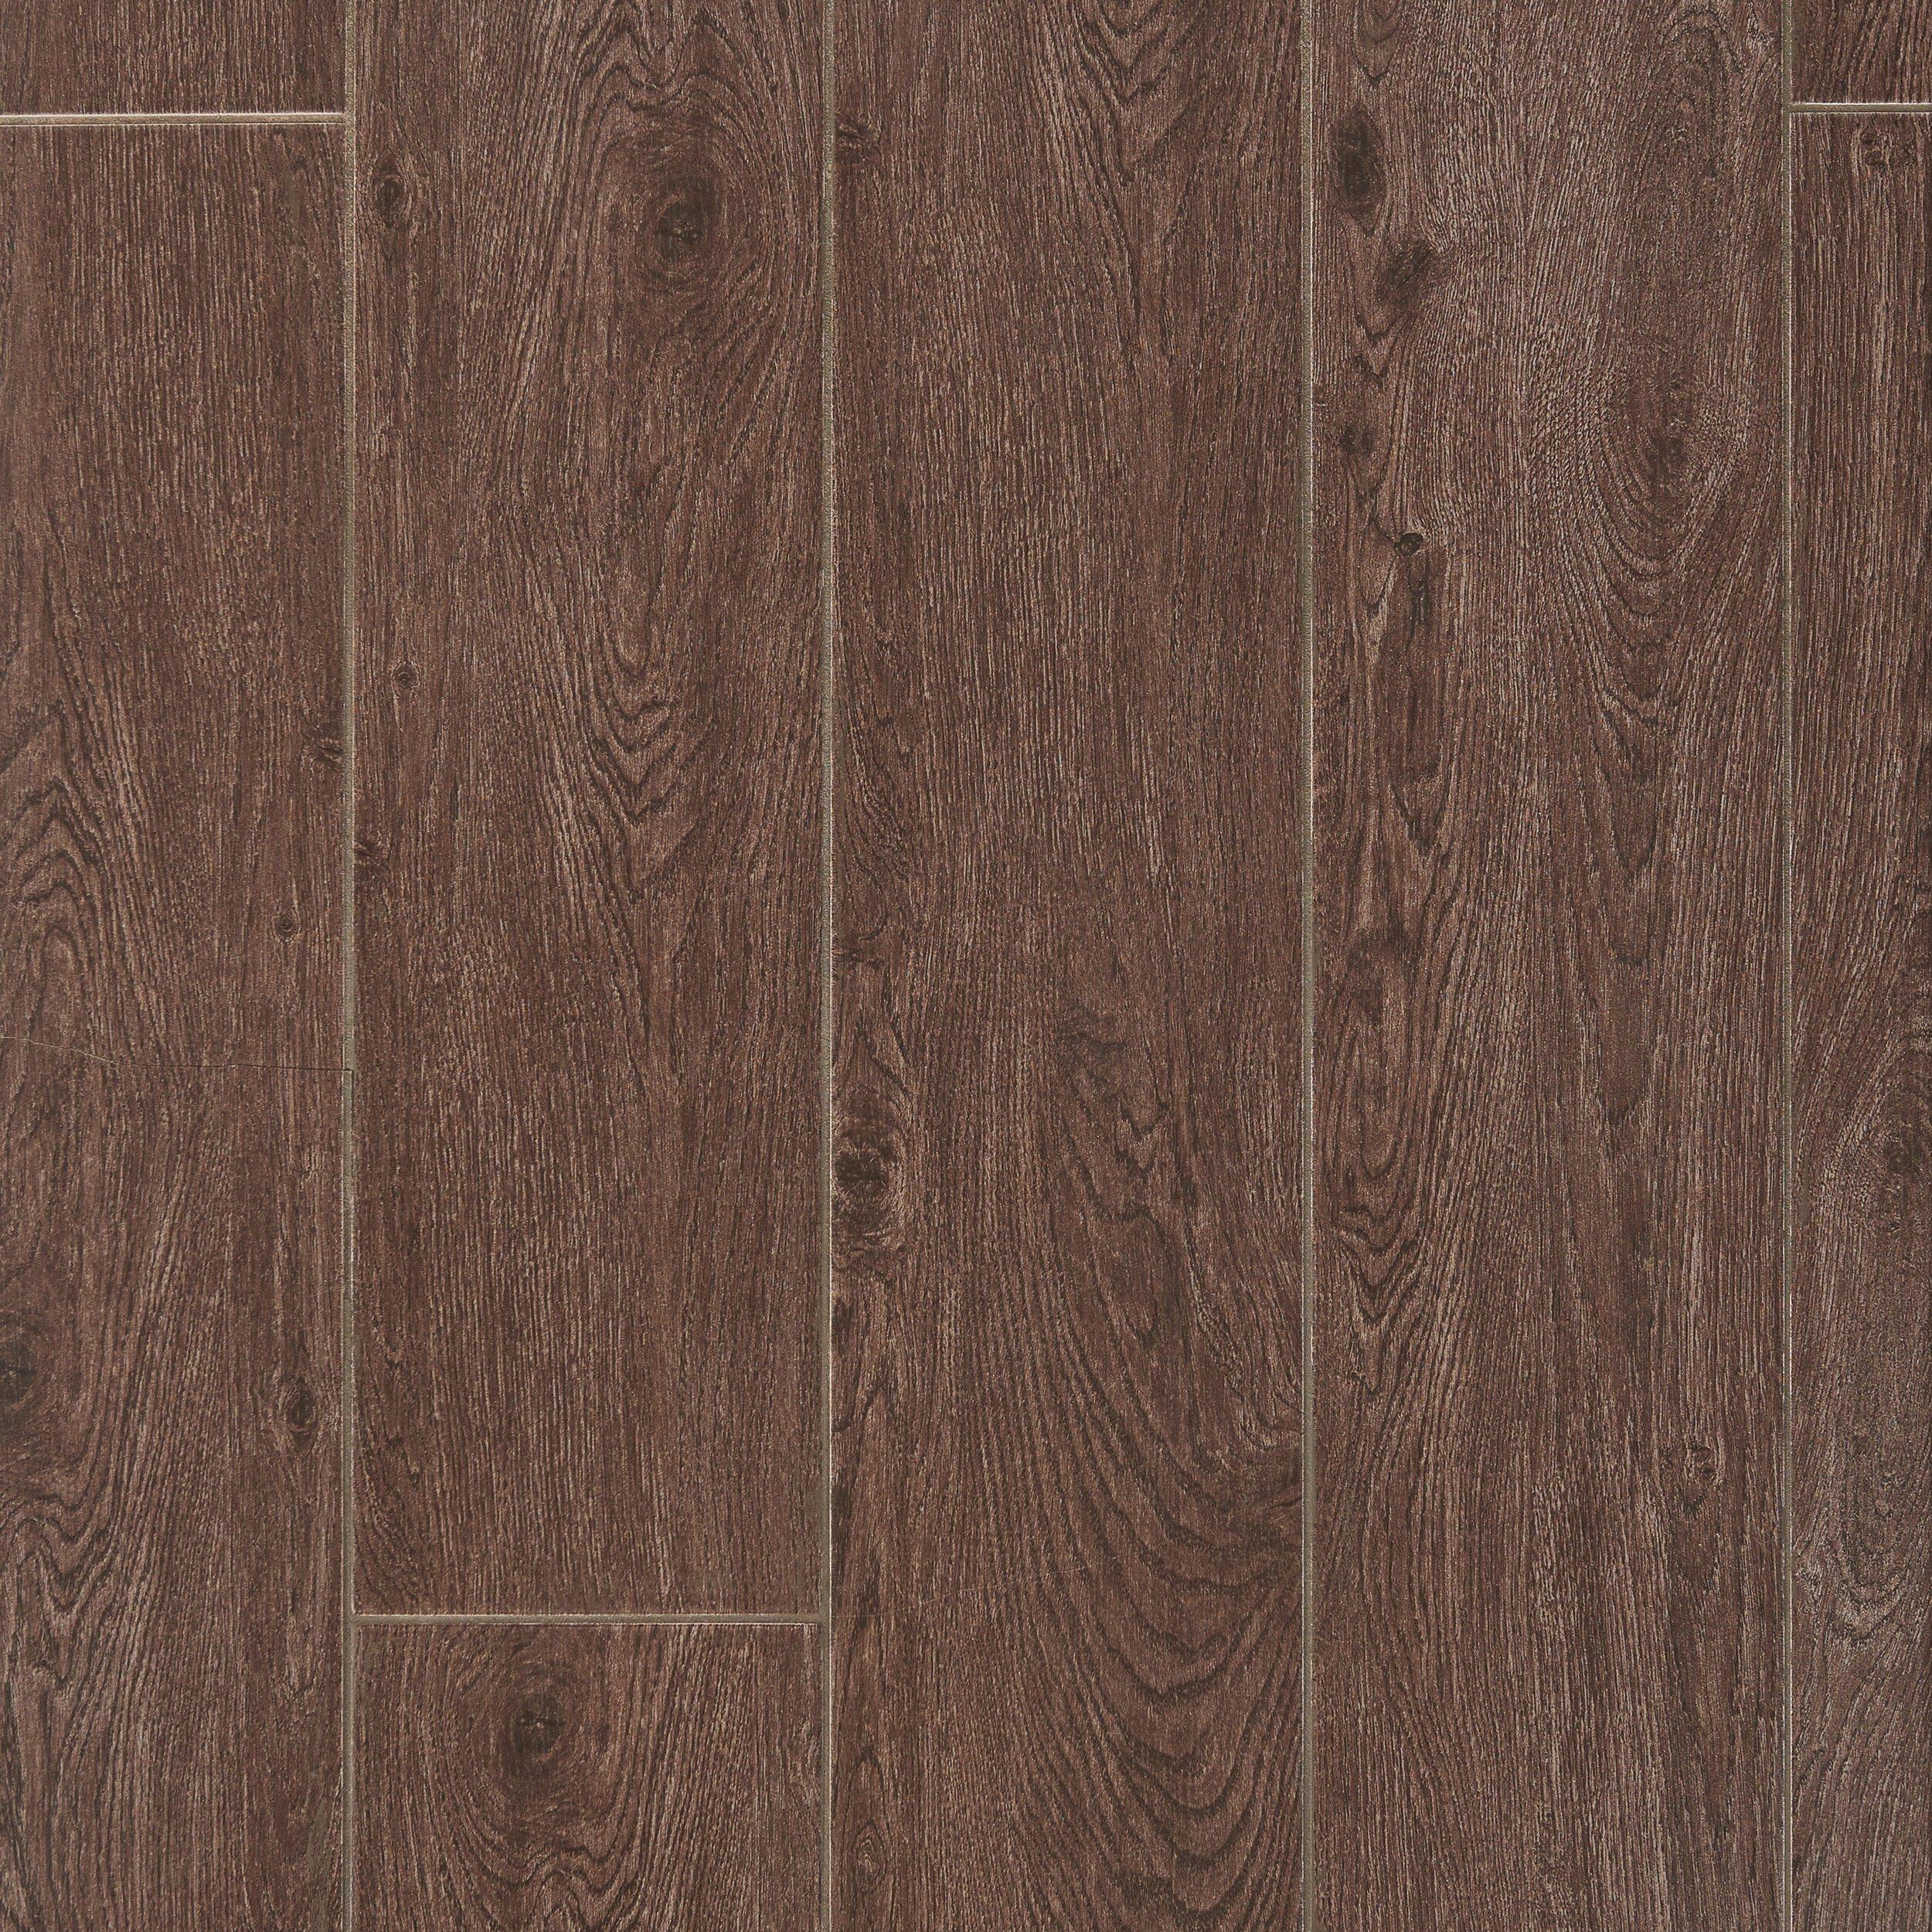 Ceramic wood plank tiles gallery tile flooring design ideas dark wood ceramic tile gallery tile flooring design ideas ceramic wood tile maduro dark wood plank doublecrazyfo Gallery